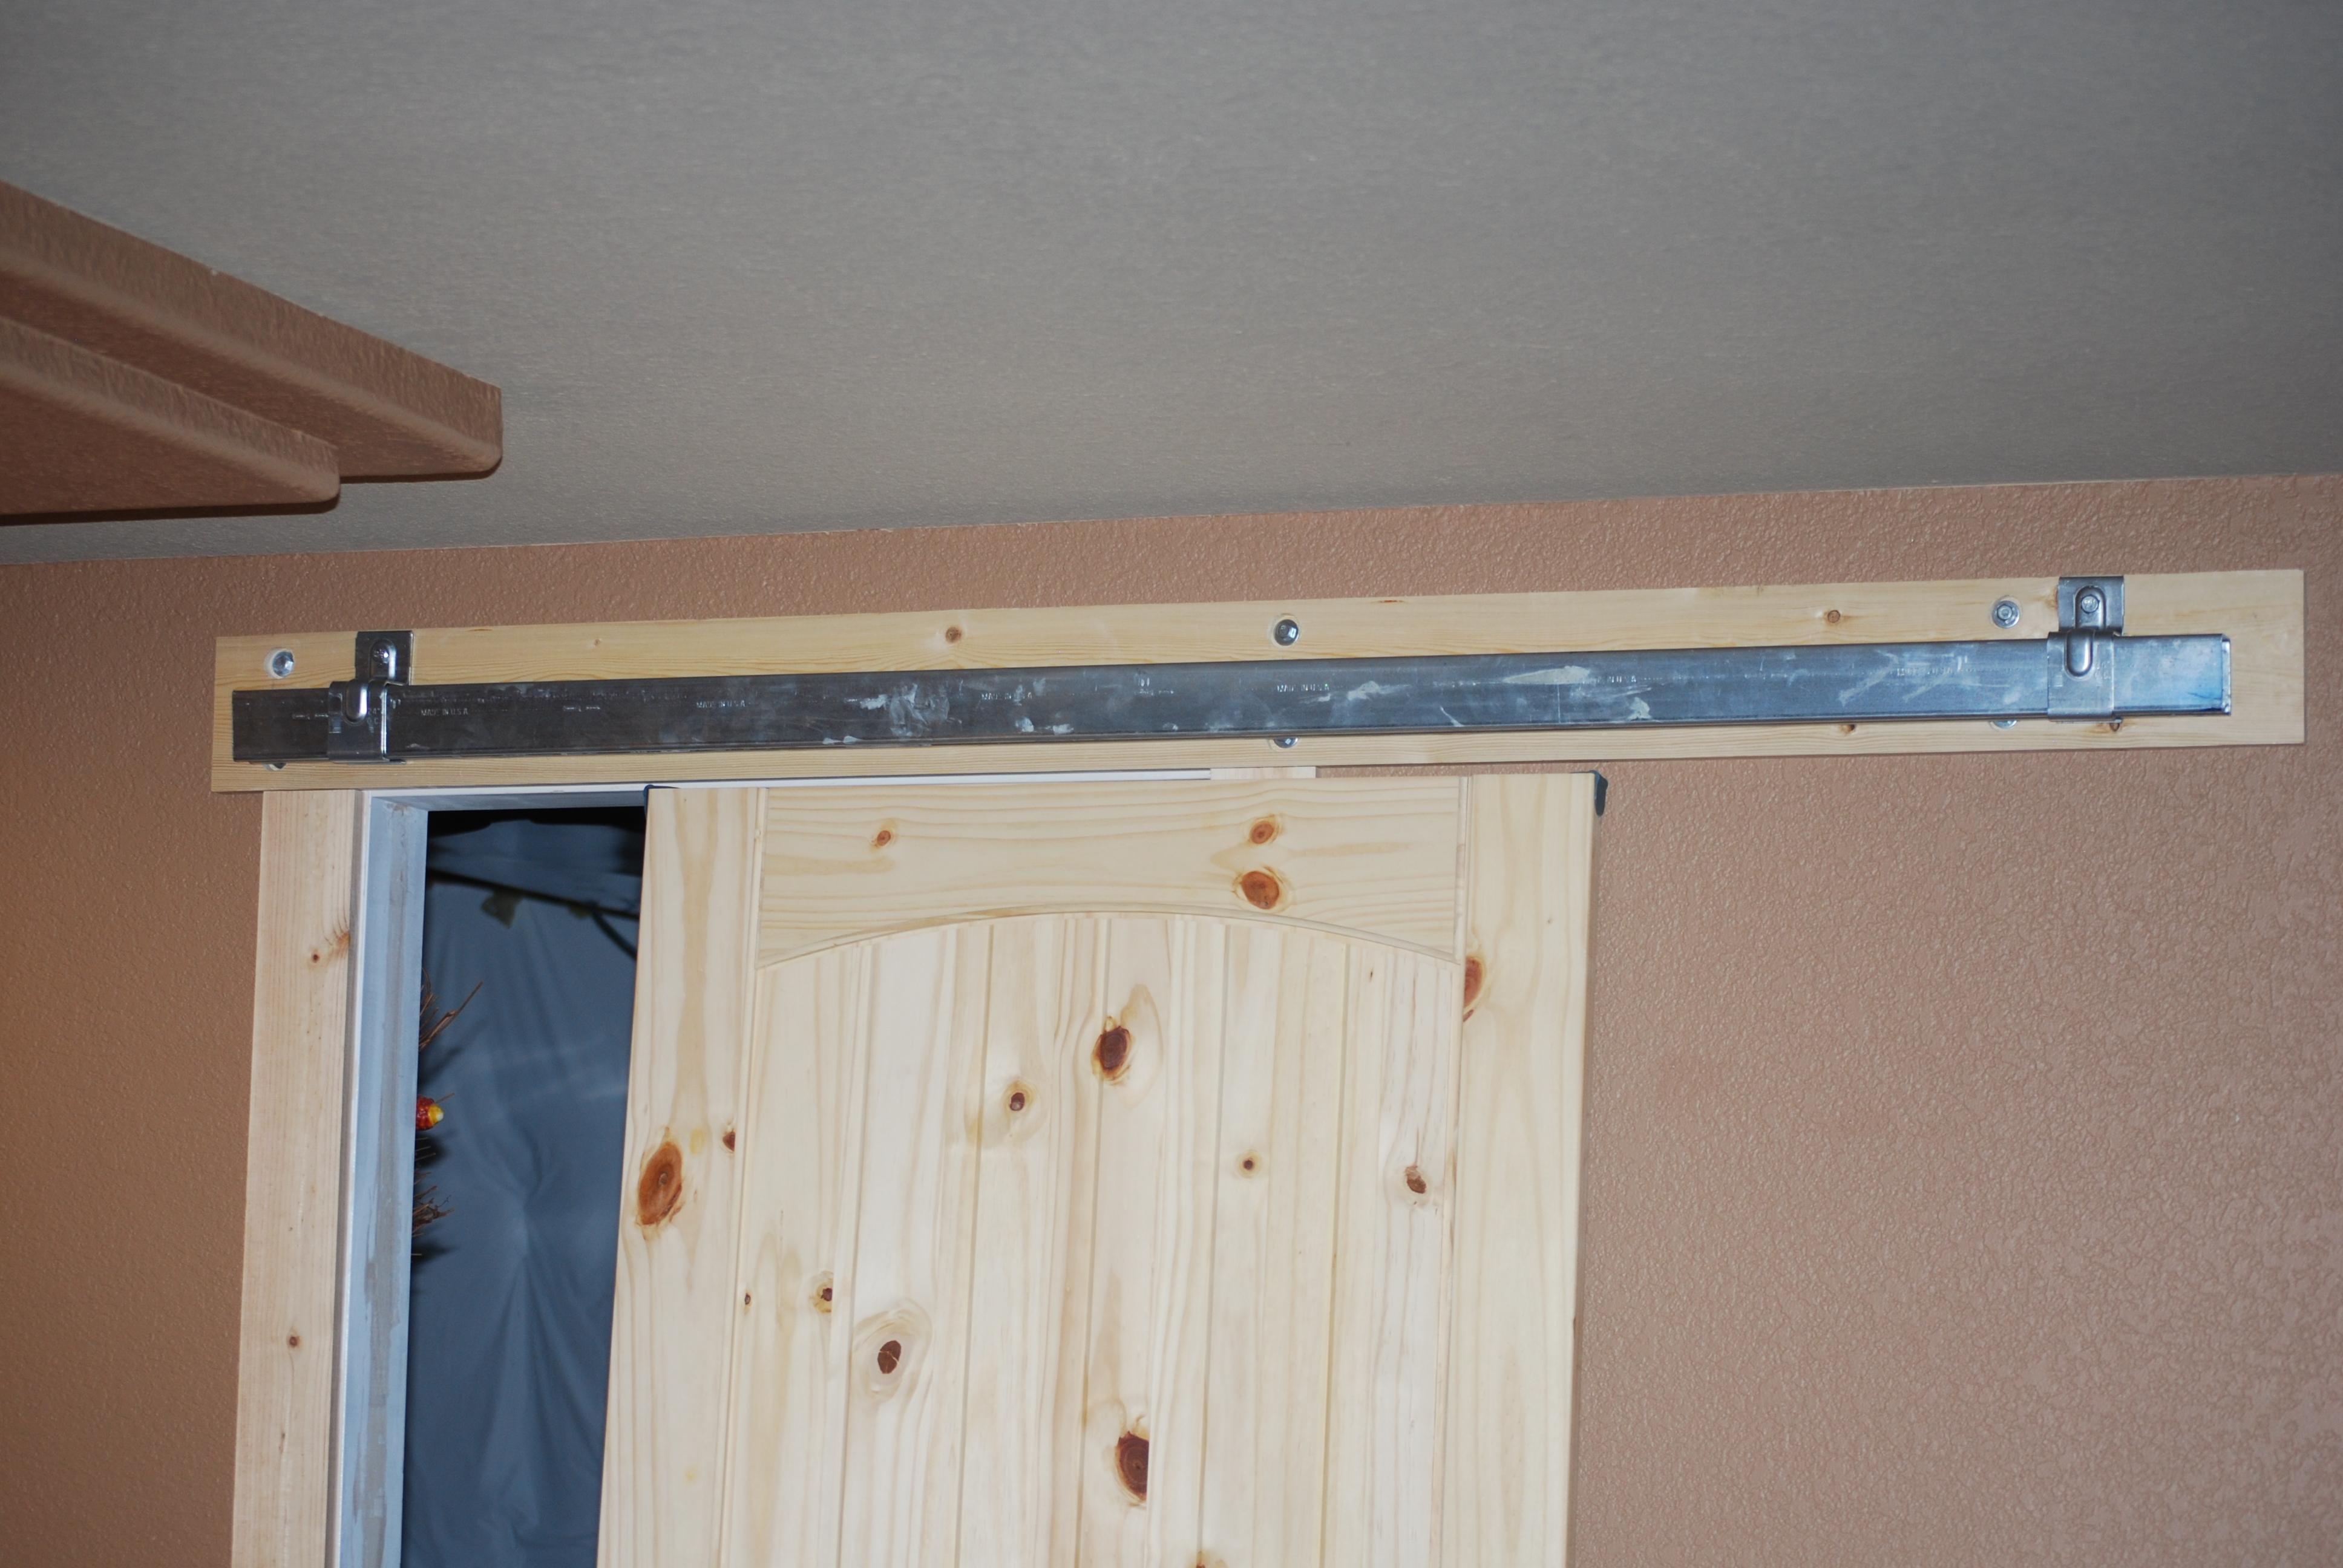 Stanley Bypass Sliding Barn Door Hardwarestanley barn door hardware 30000 garage door repair